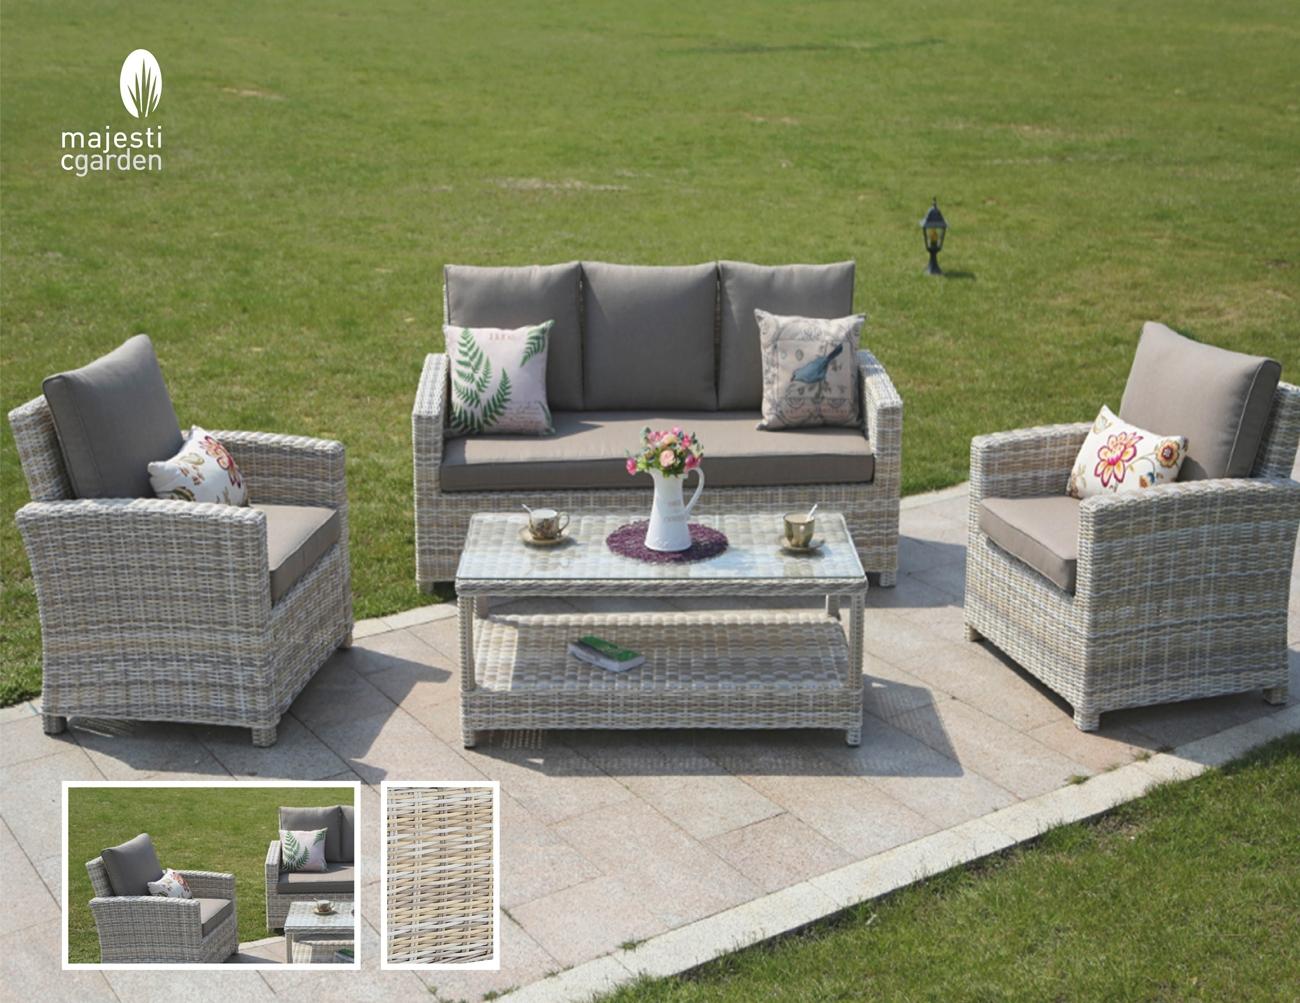 SET SOFA DE EXTERIOR NERJA - Set para terraza o jardín modelo NERJA SOFÁ de Majestic Garden